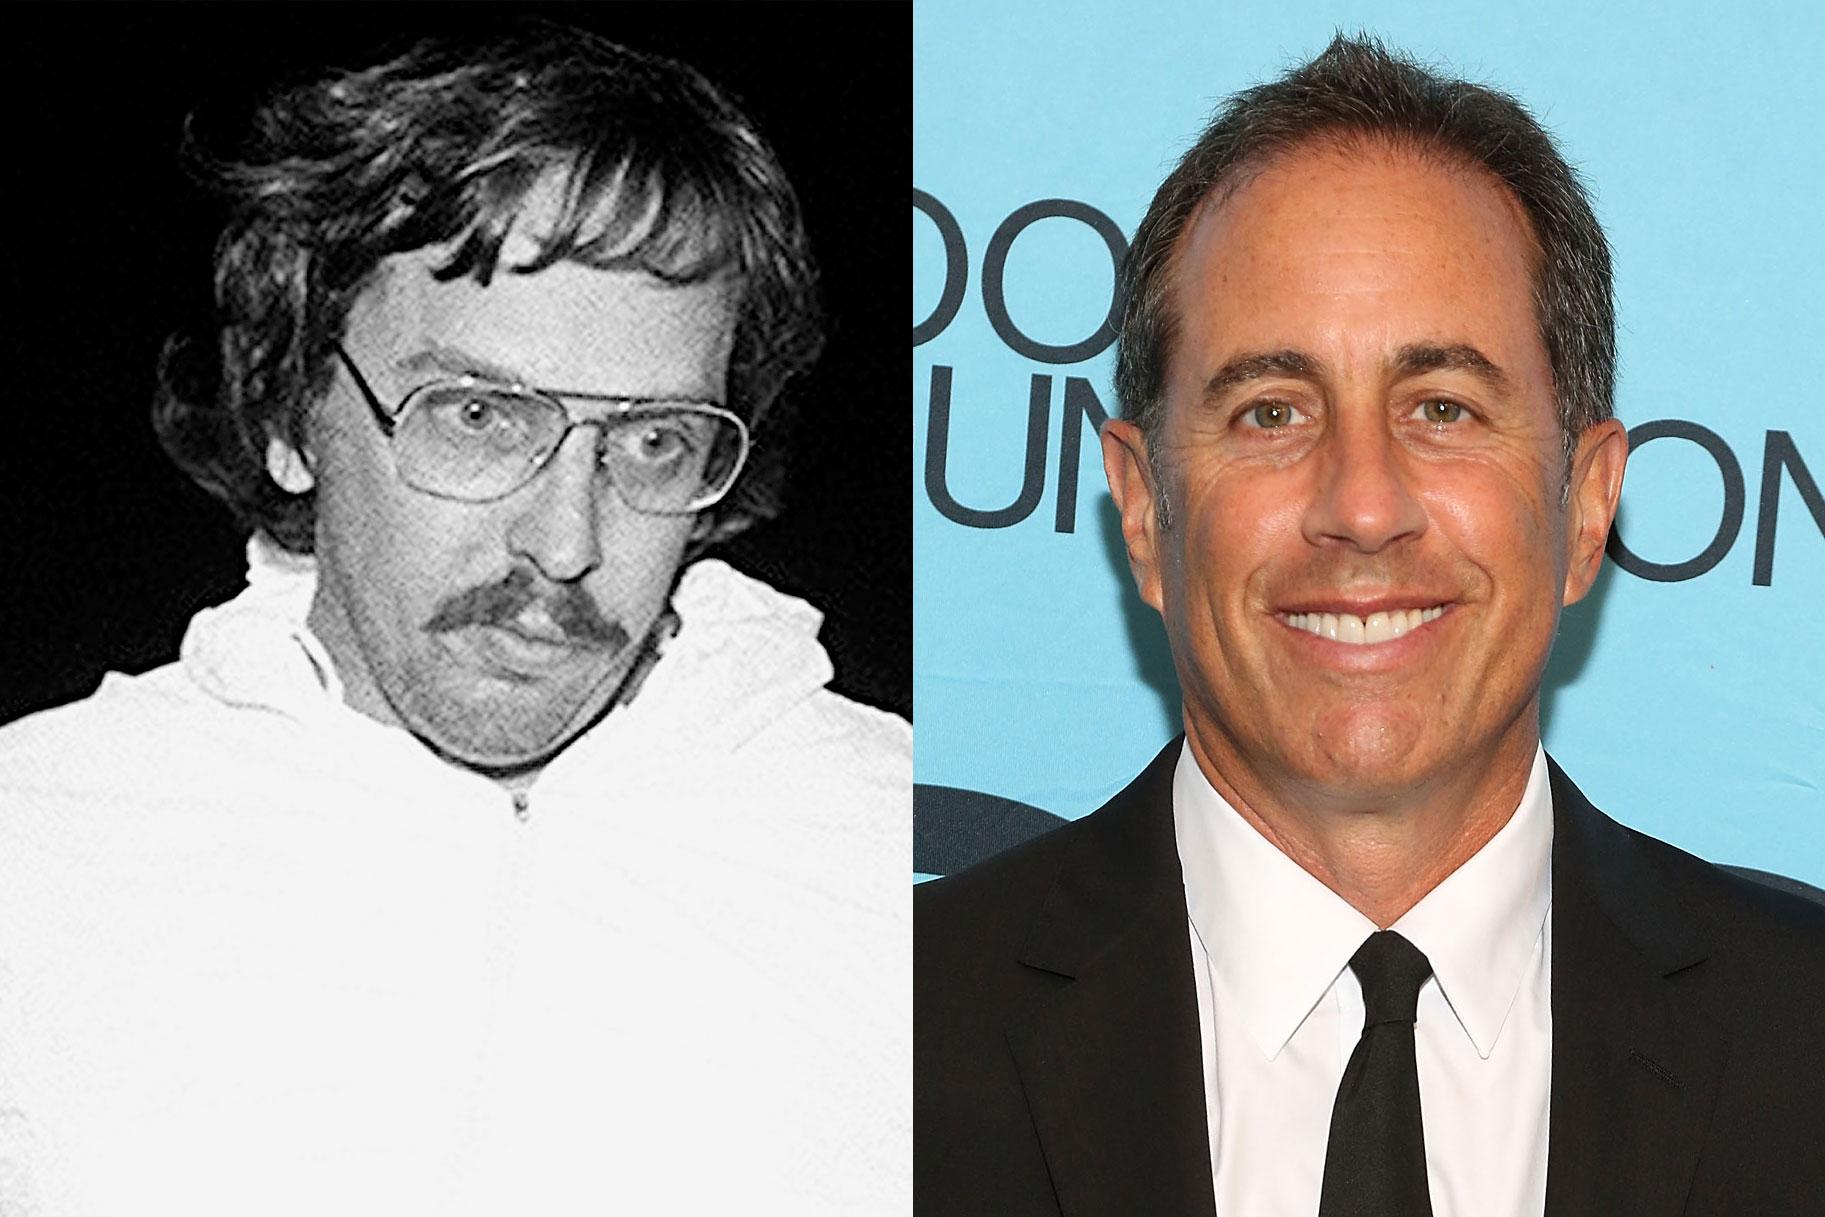 Kuidas sarimõrvar inspireeris osa Seinfeldist